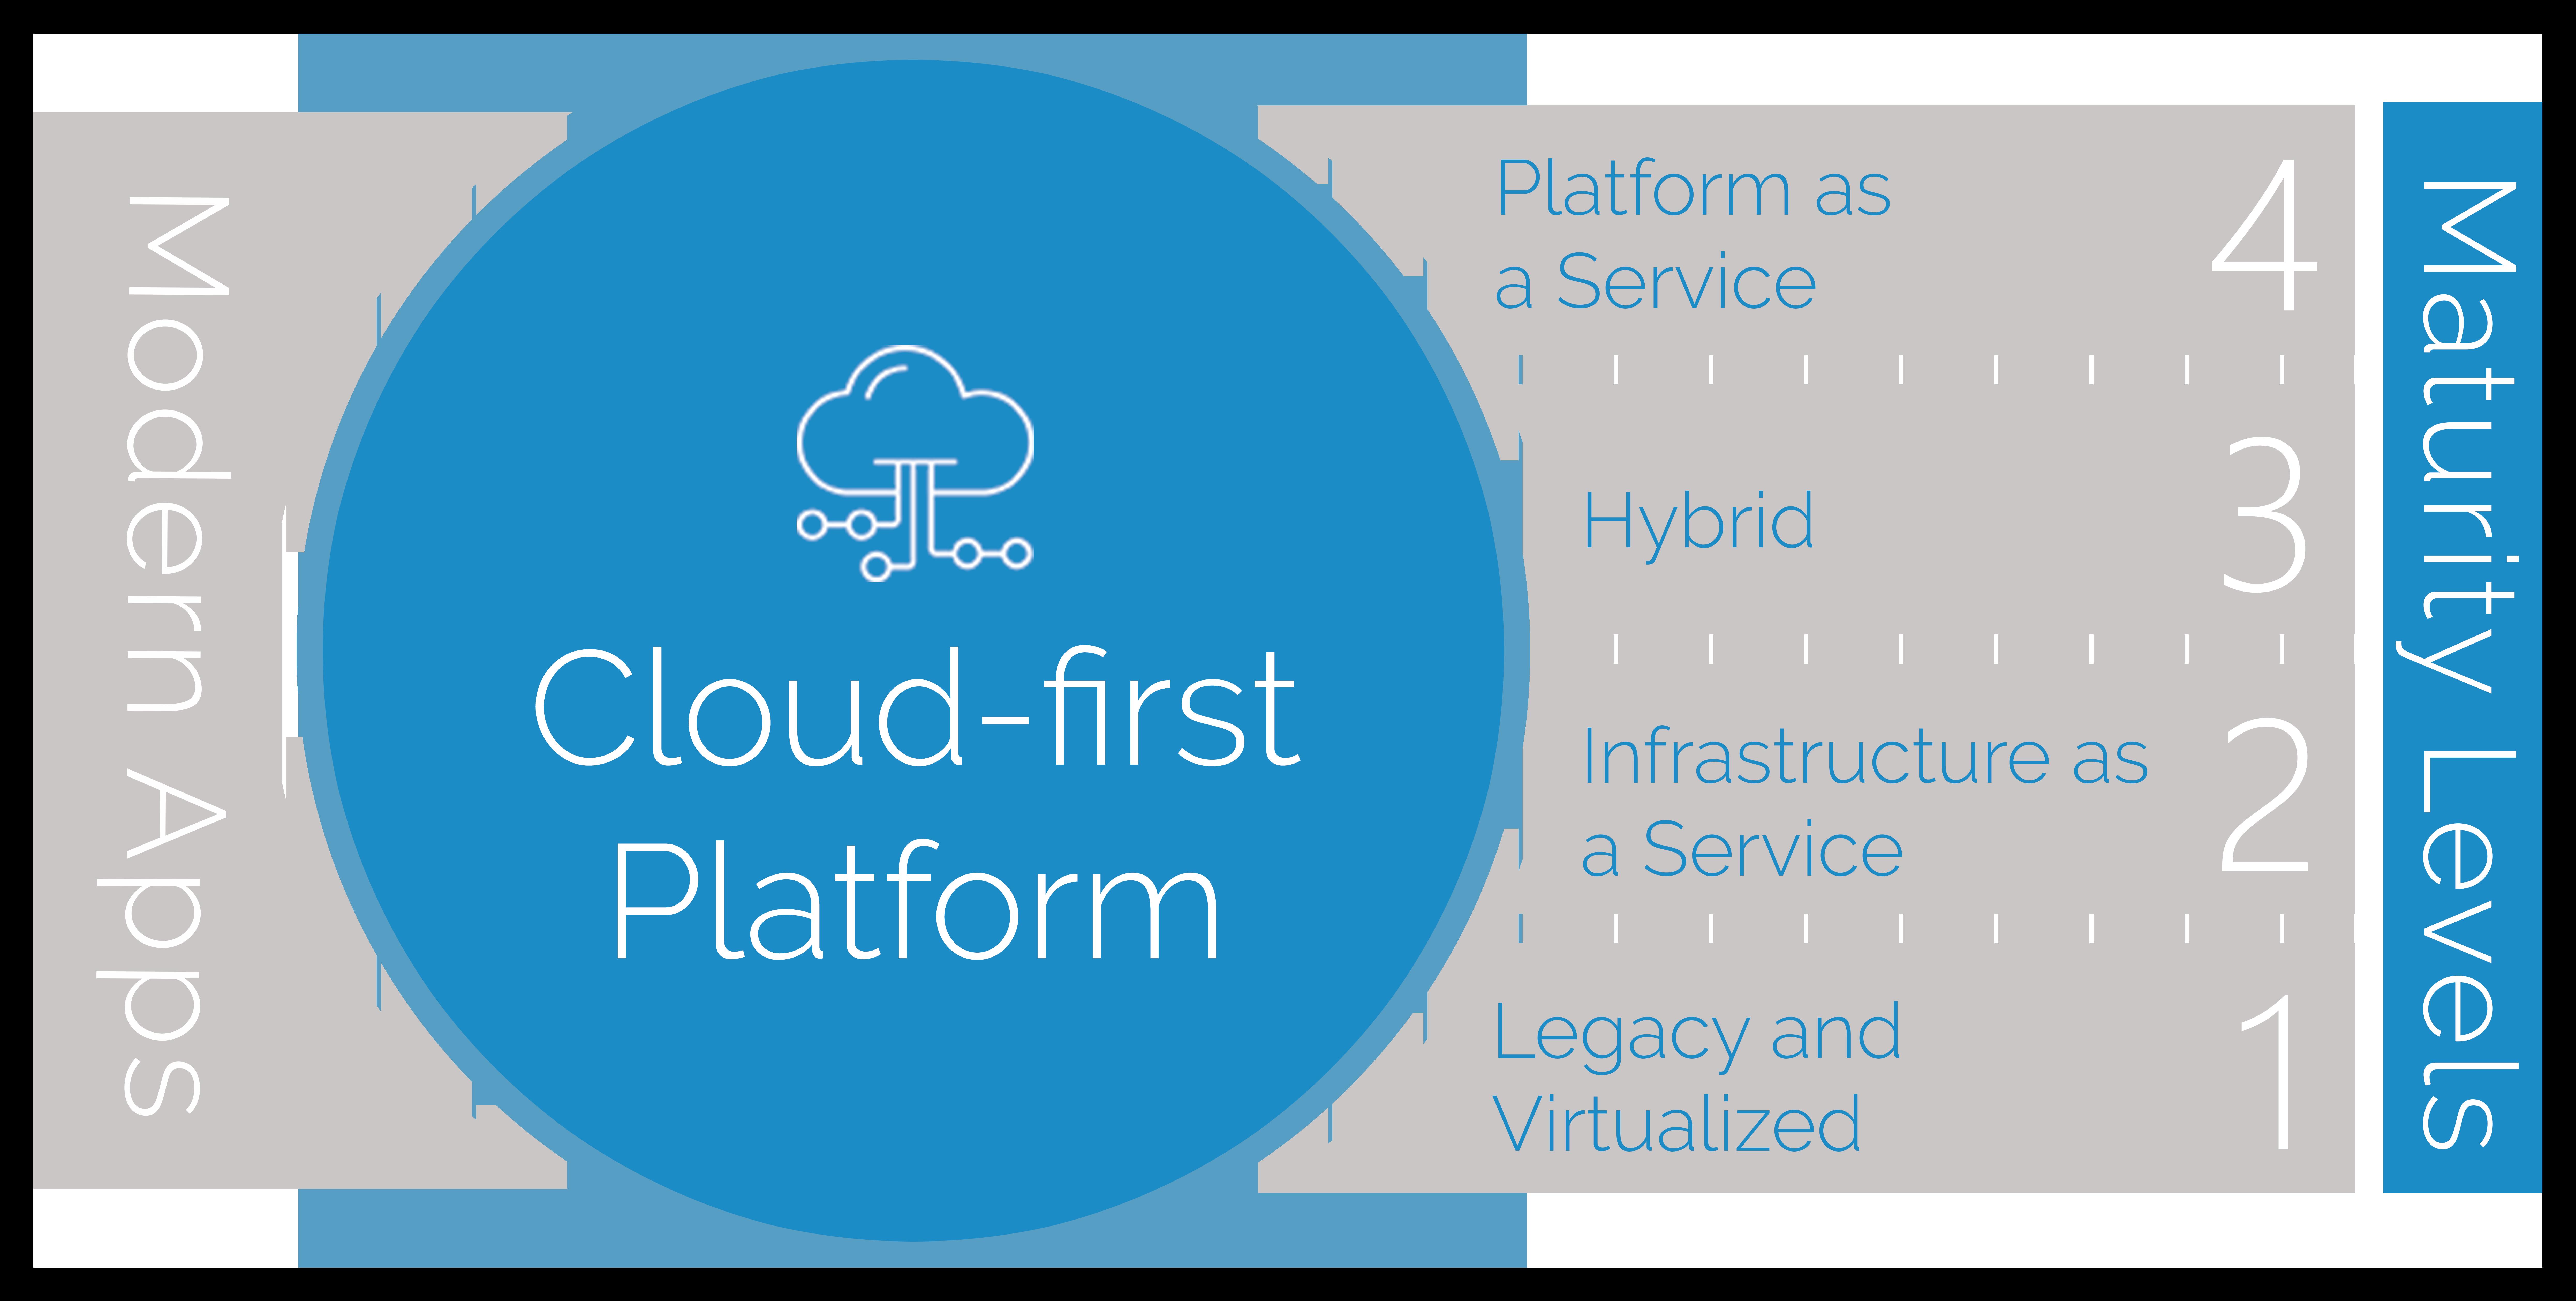 Cloud-first platform maturity modelpng